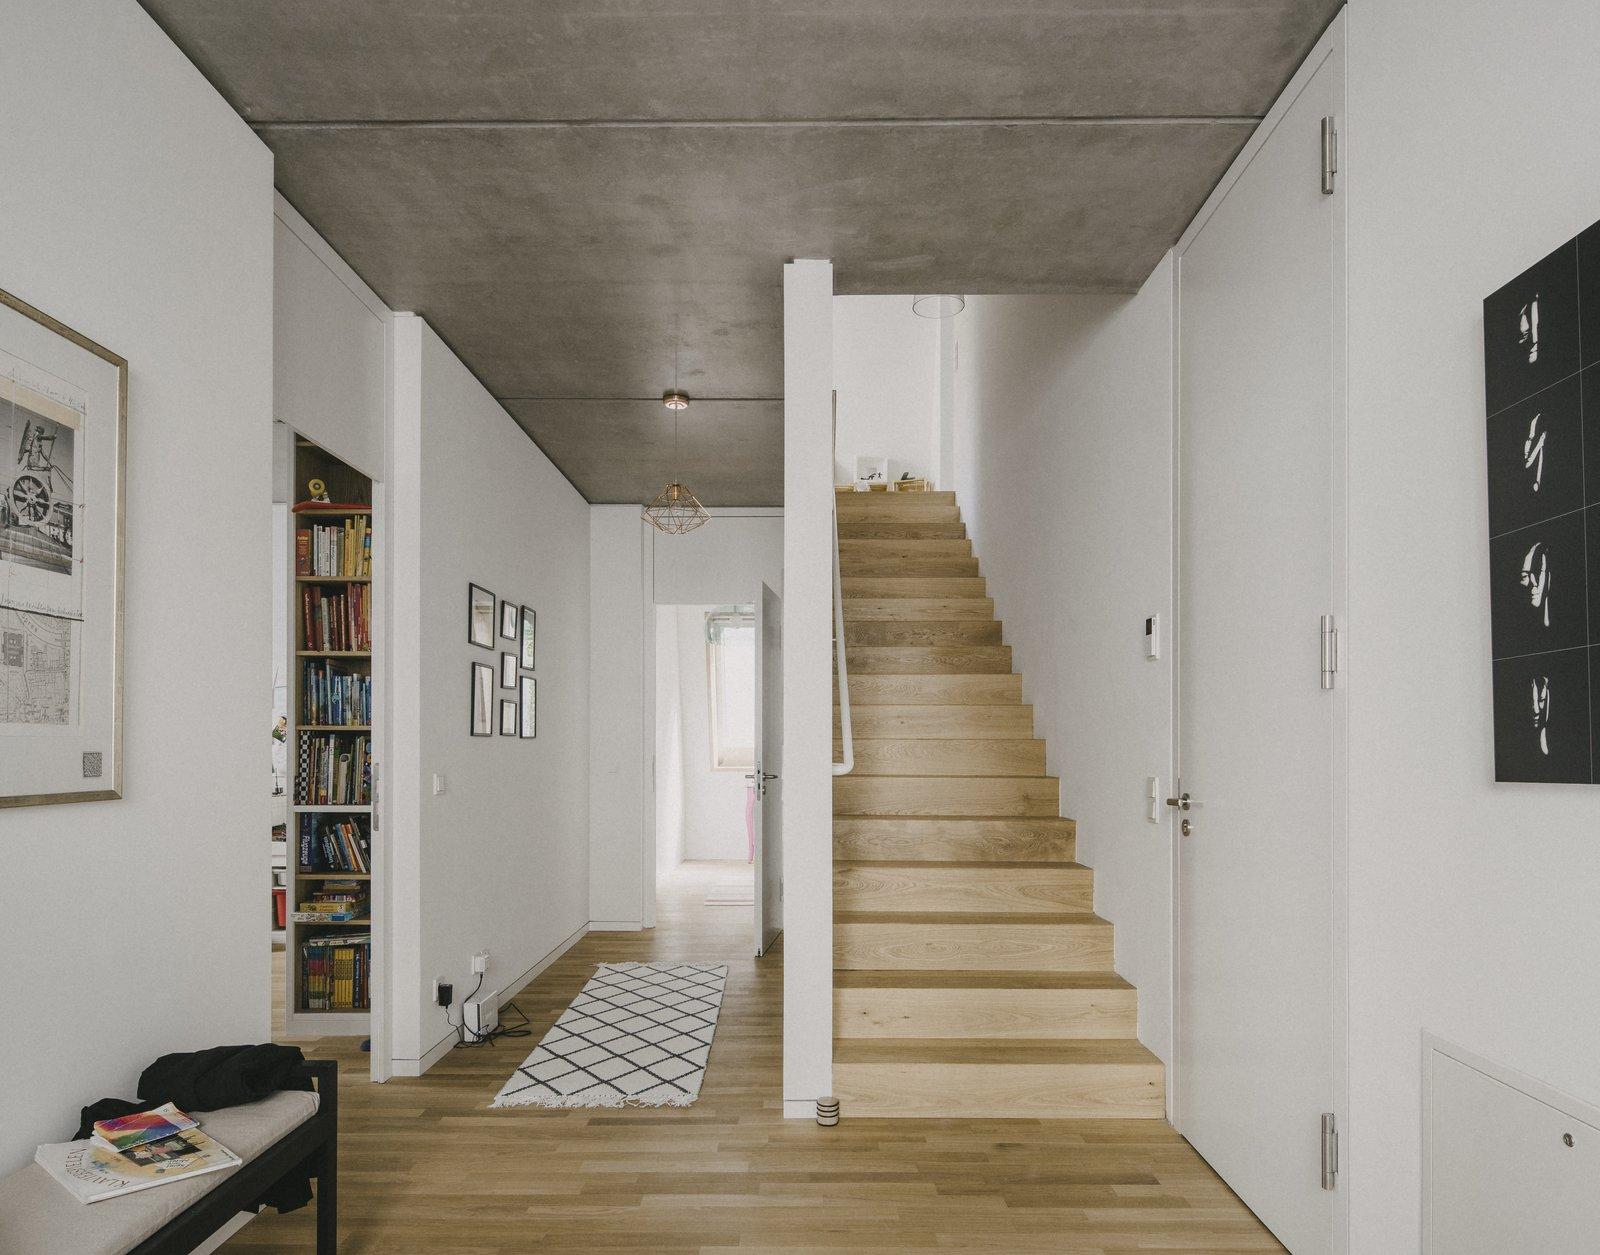 Light Hardwood Floor, Living Room, Bench, Bookcase, Ceiling Lighting, and Concrete Floor  Apartment House Prenzlauer Berg by Barkow Leibinger